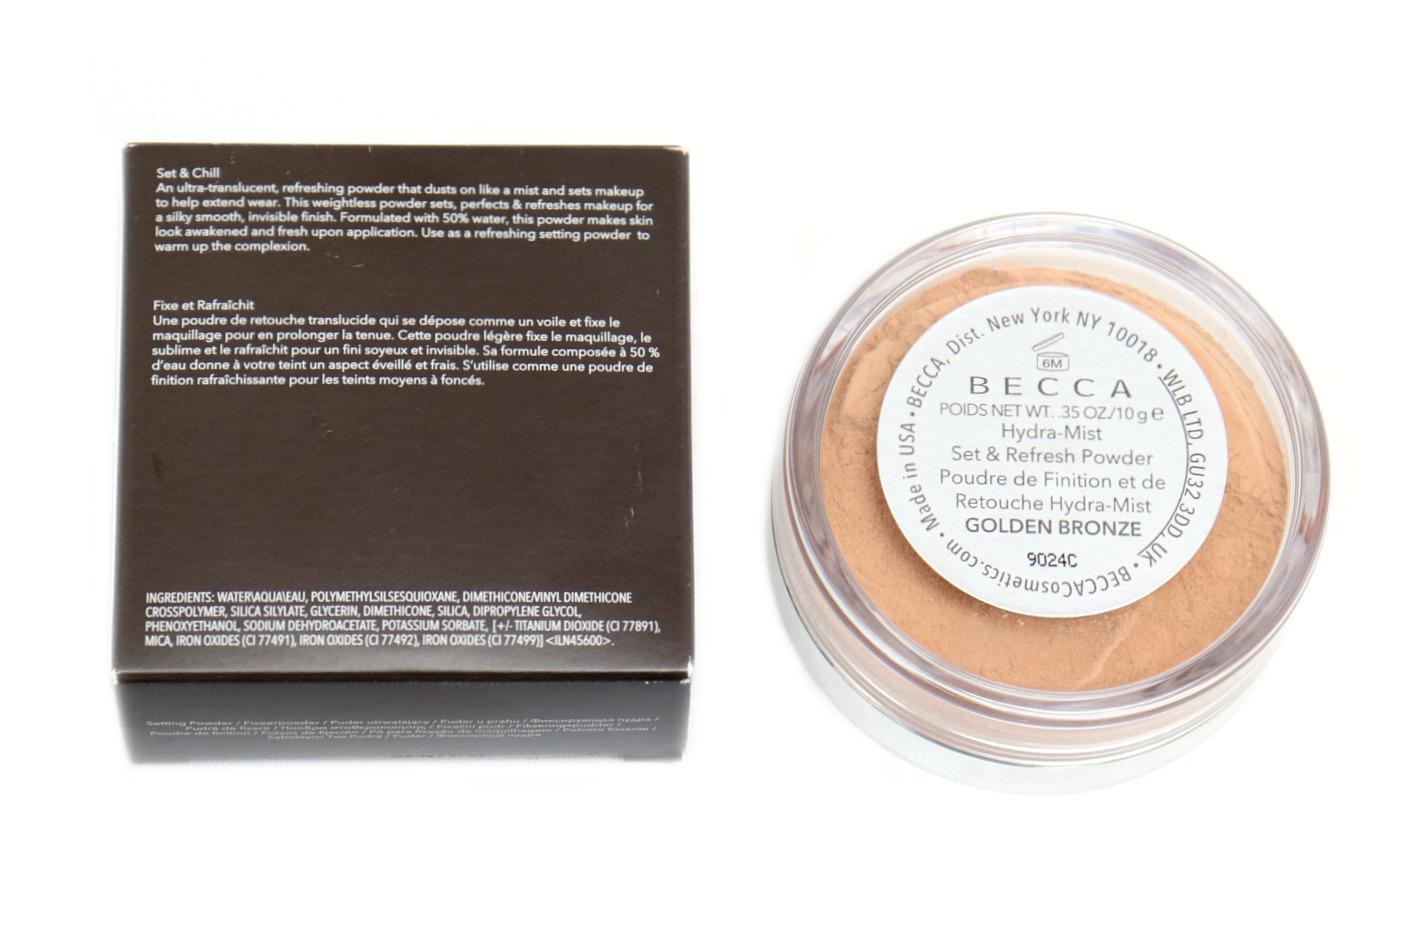 BECCA Hydra Mist Set & Refresh Powder Review